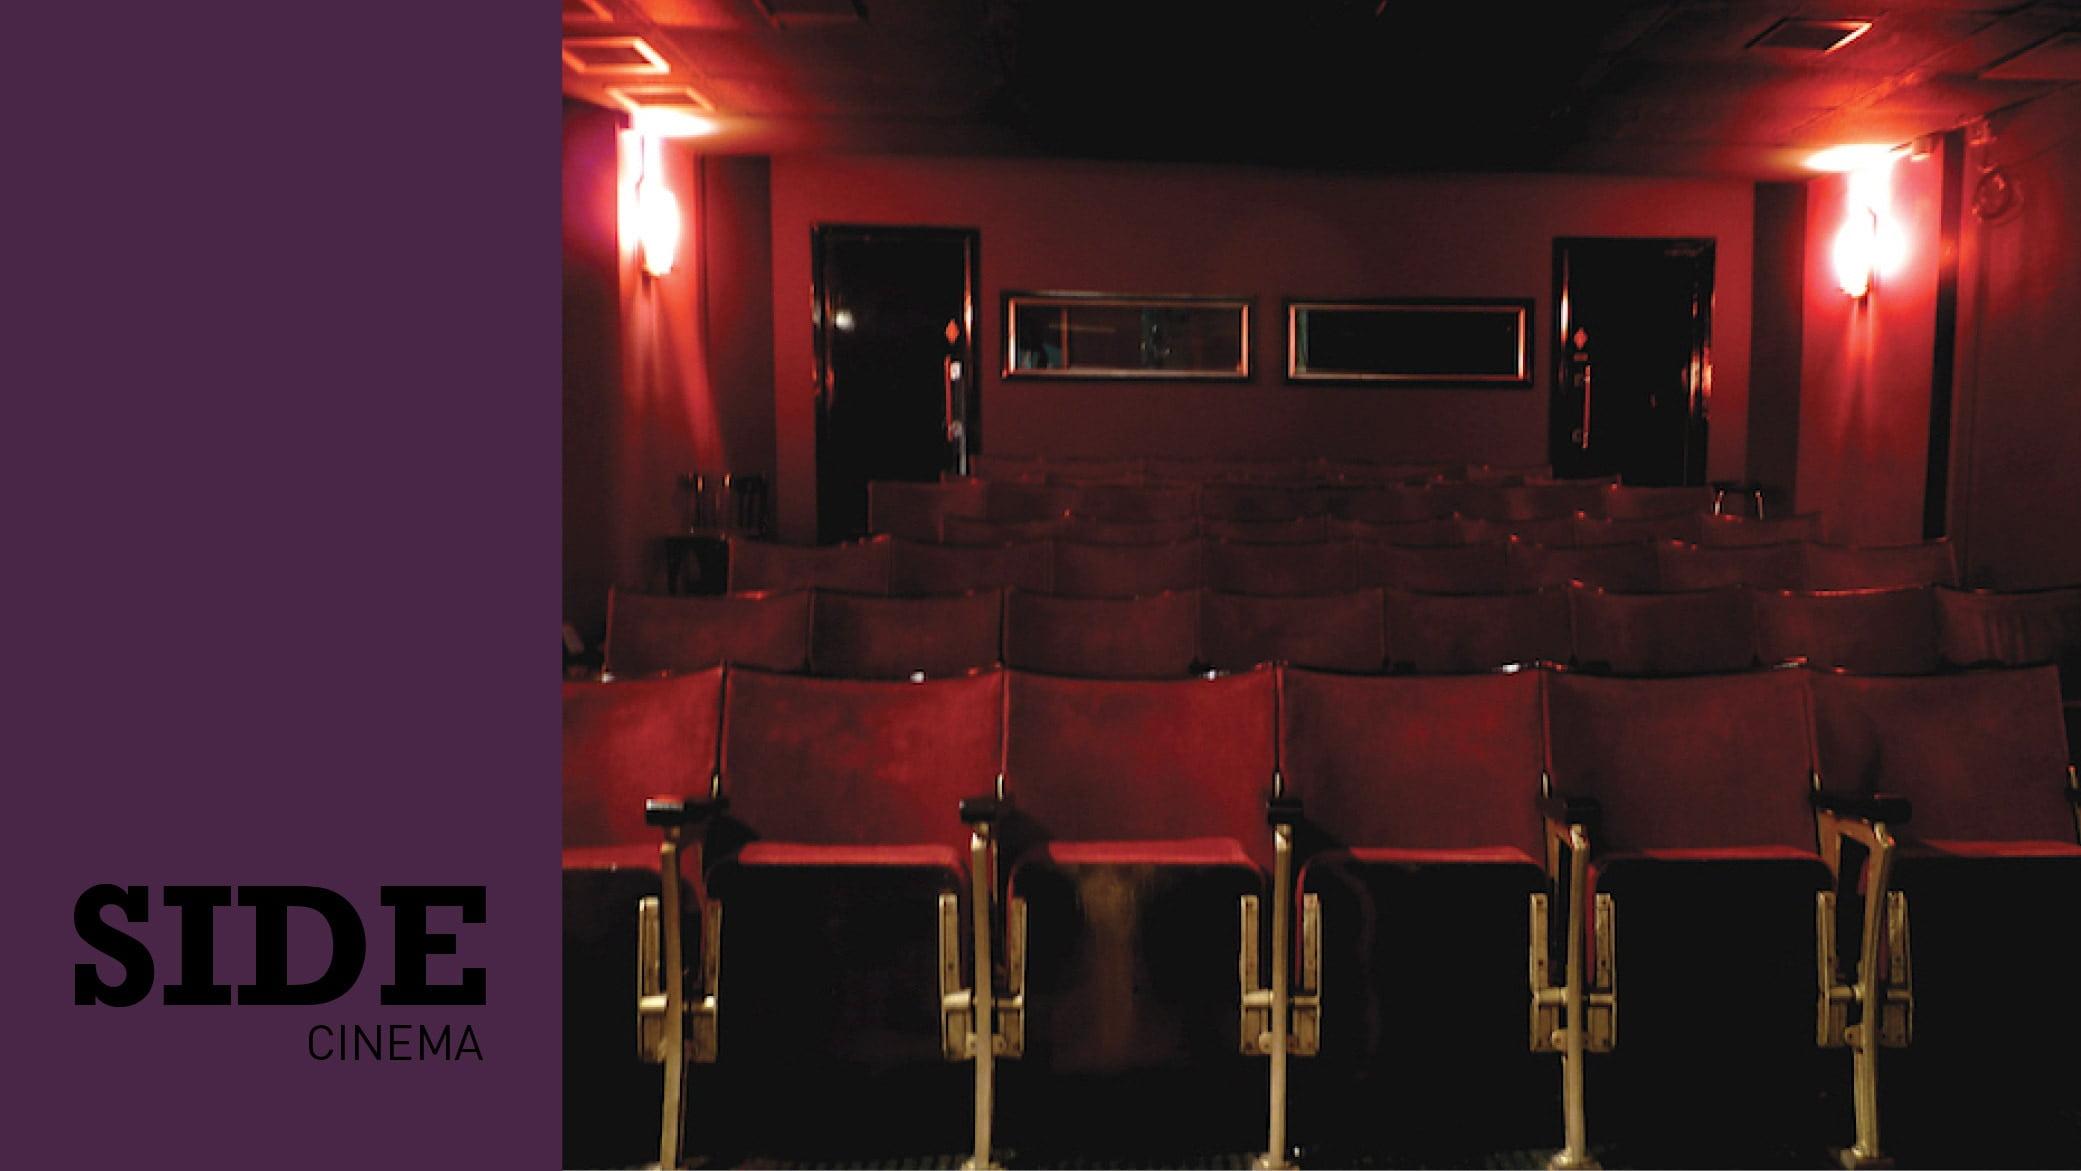 Side Cinema Amber -> Fotos De Cinemas